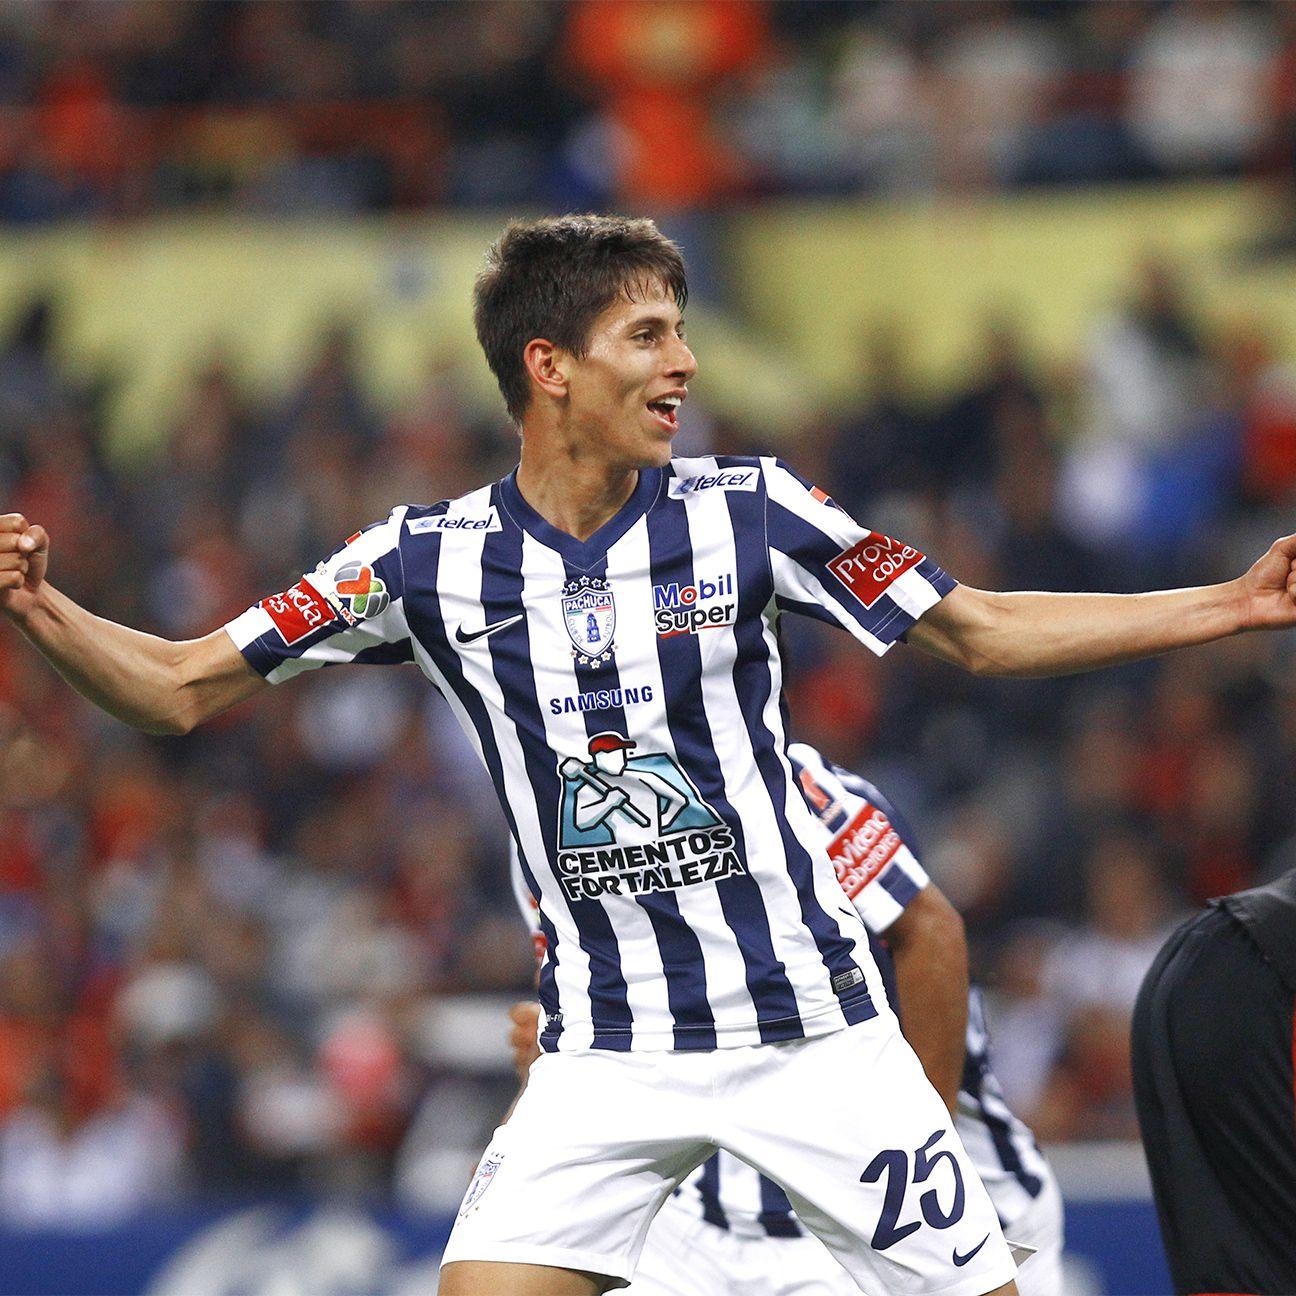 Premier League target Jurgen Damm spearheaded Pachuca's 3-1 win at Atlas on Saturday.